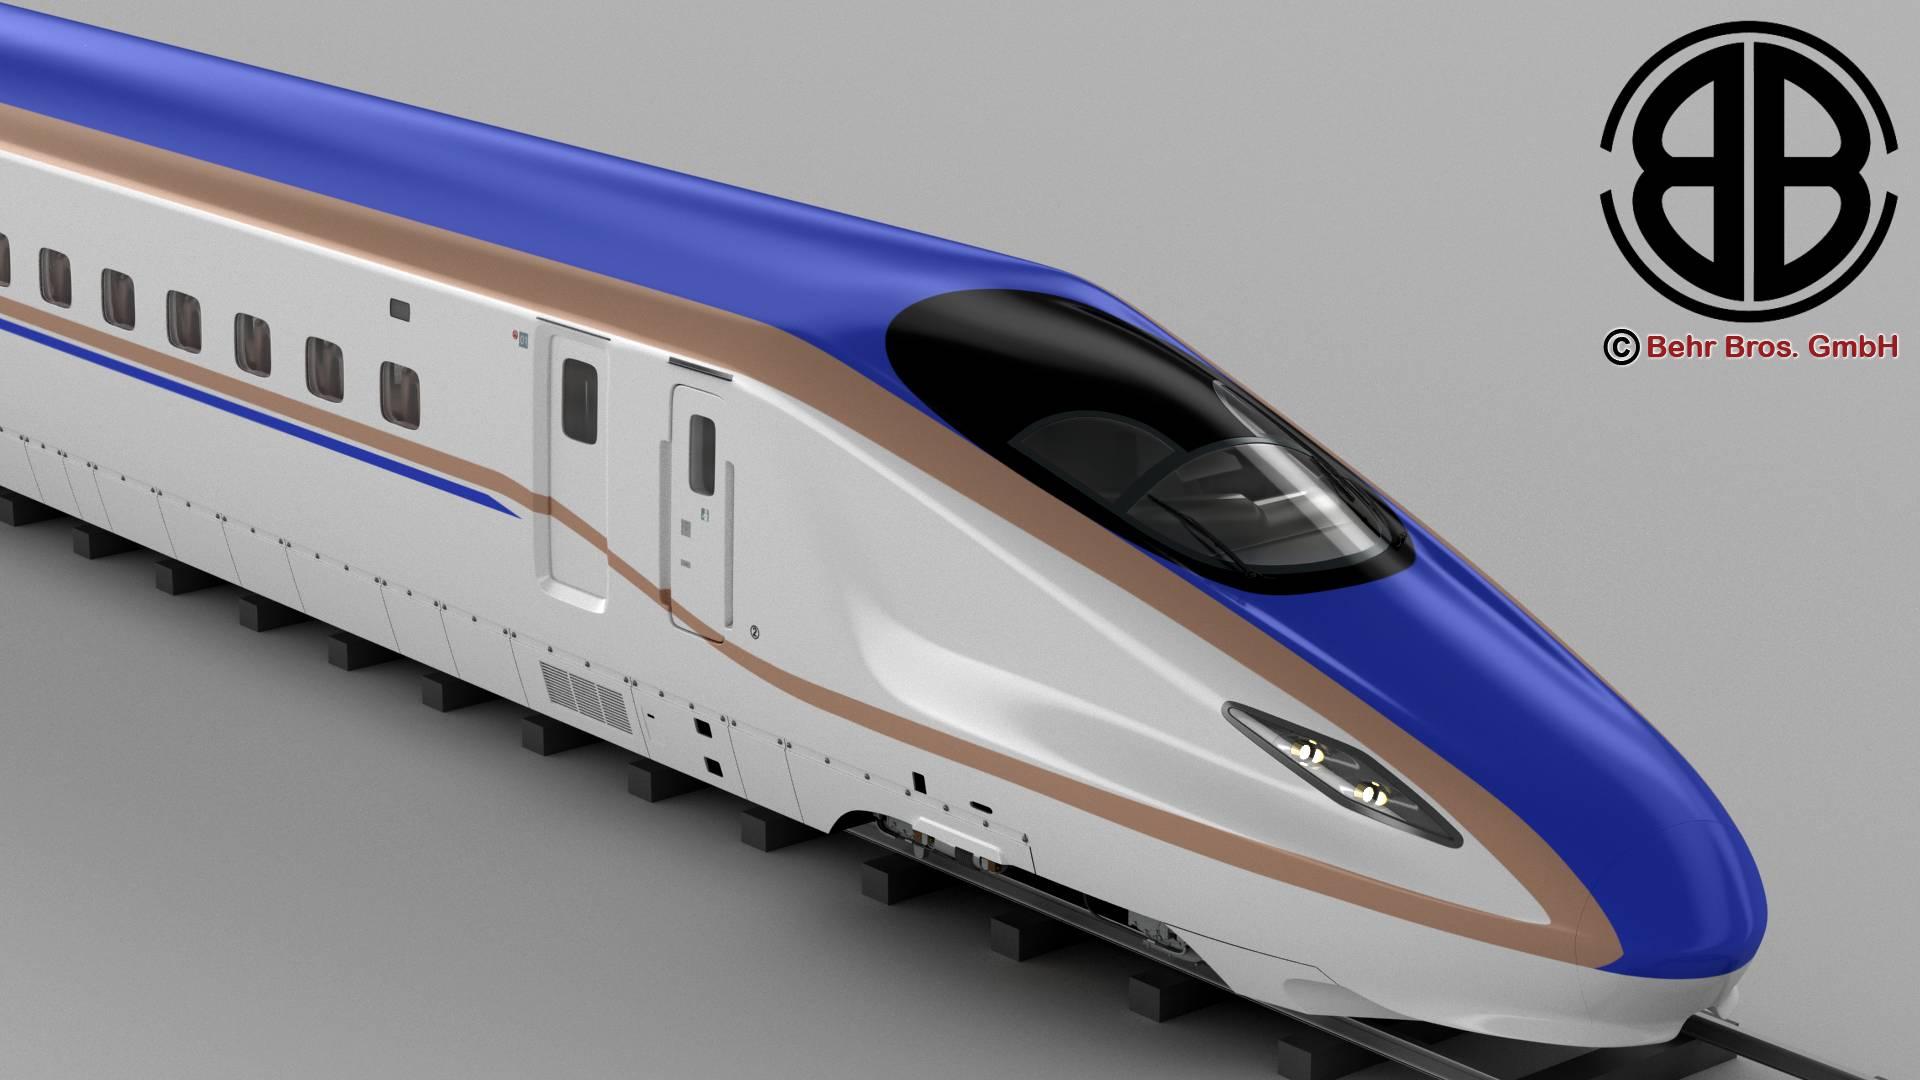 shinkansen e7 3d líkan 3ds max fbx c4d lwo ma mb obj 265649